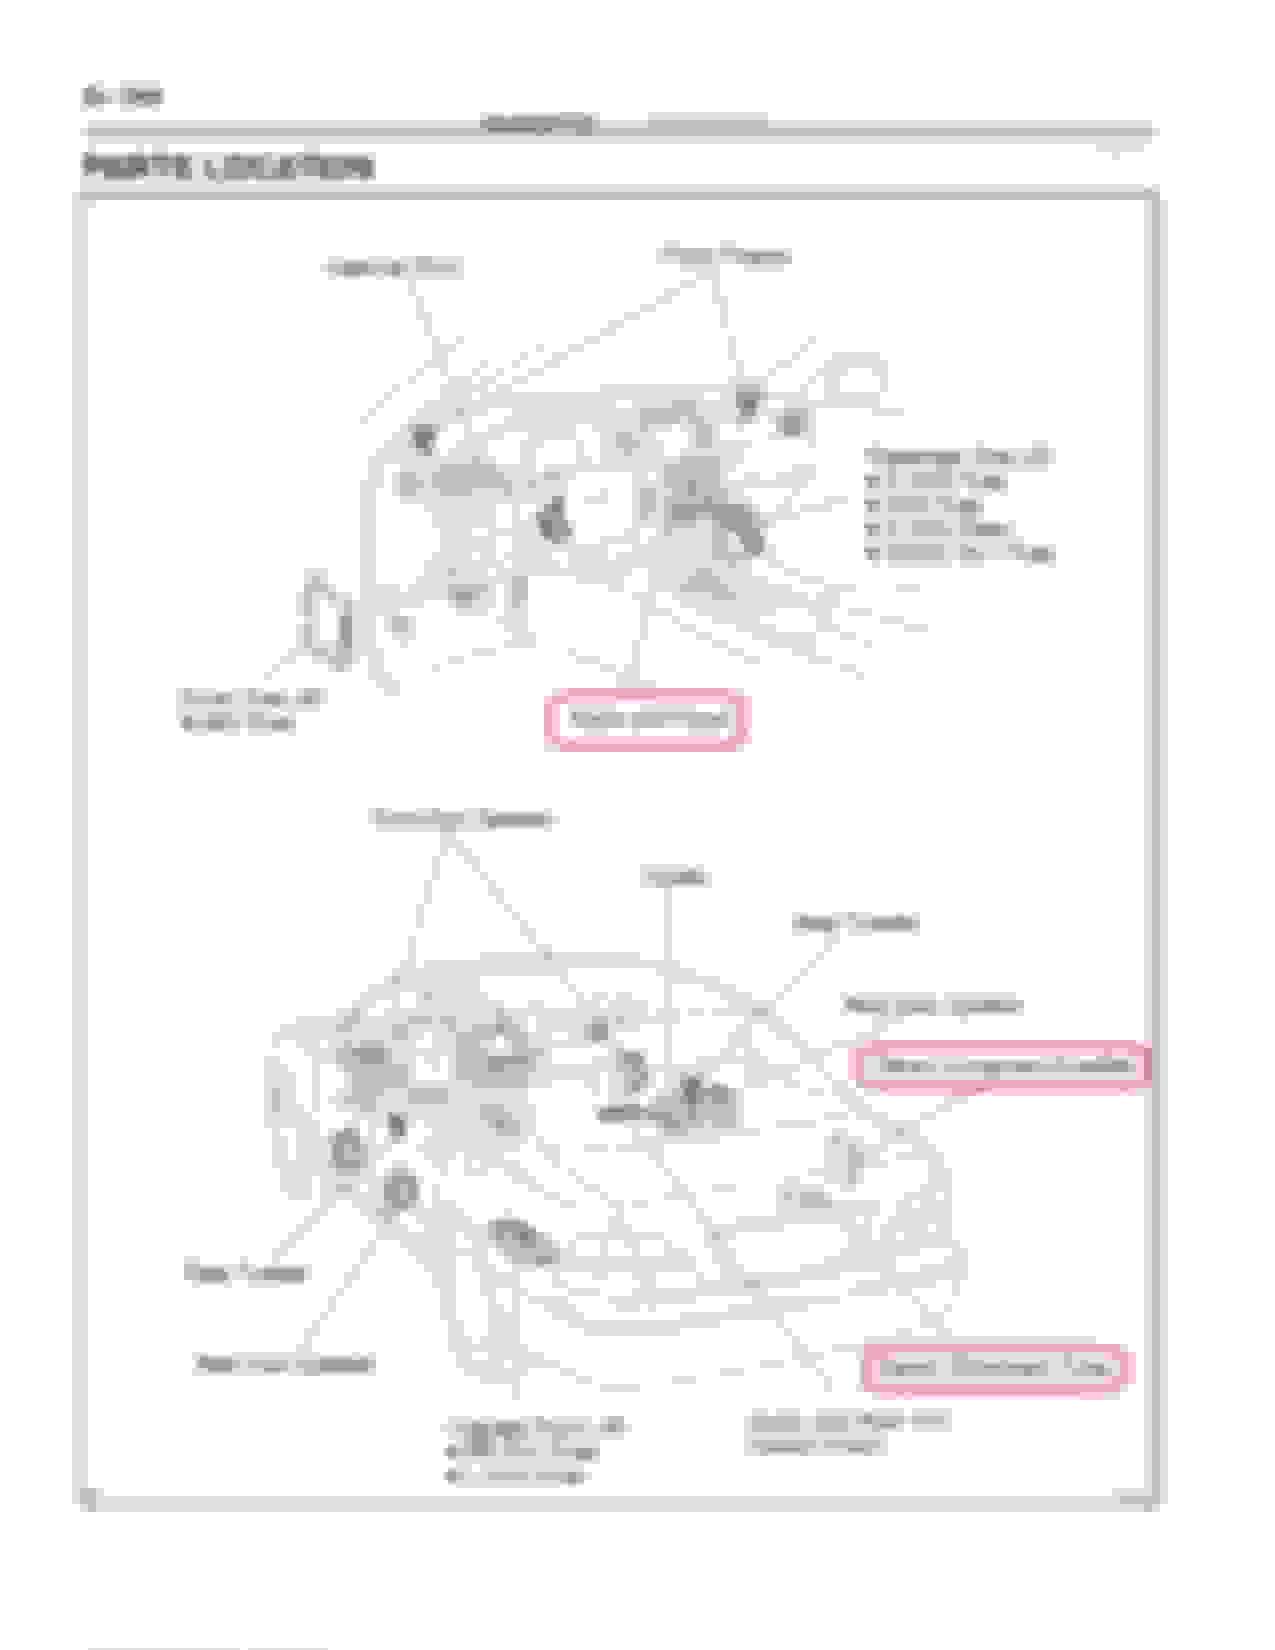 2002 LS430 Radio wiring diagram please - ClubLexus - Lexus ... on